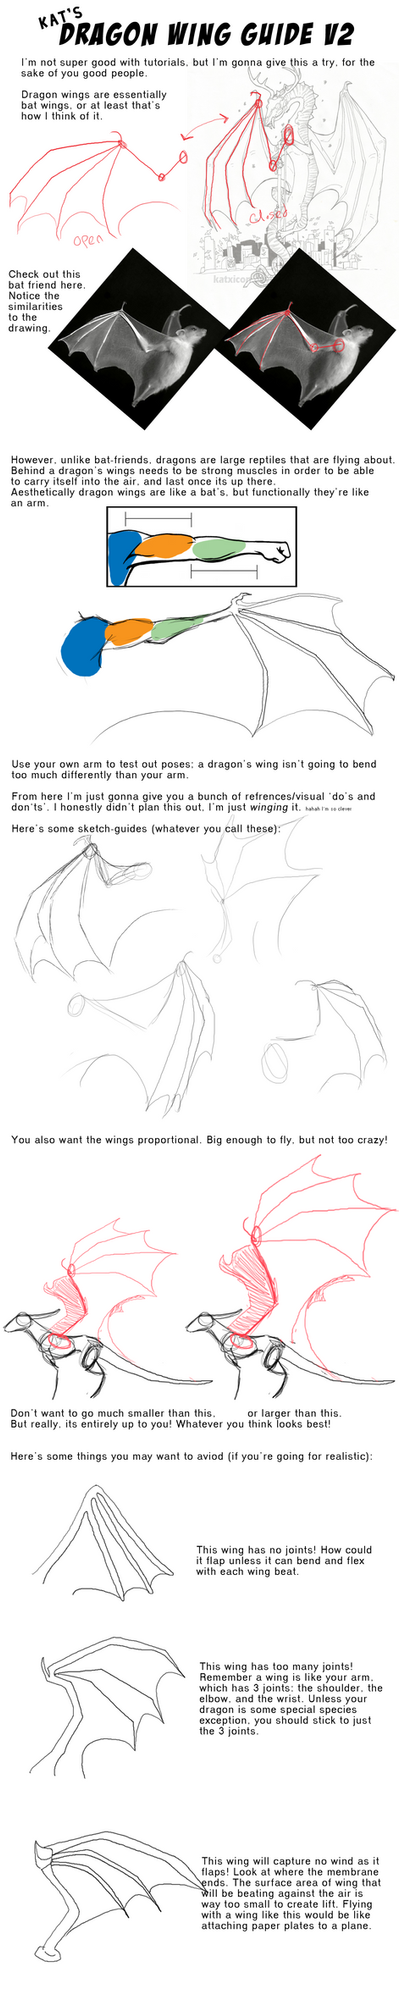 Dragon Wing Guide v2 by katxicon